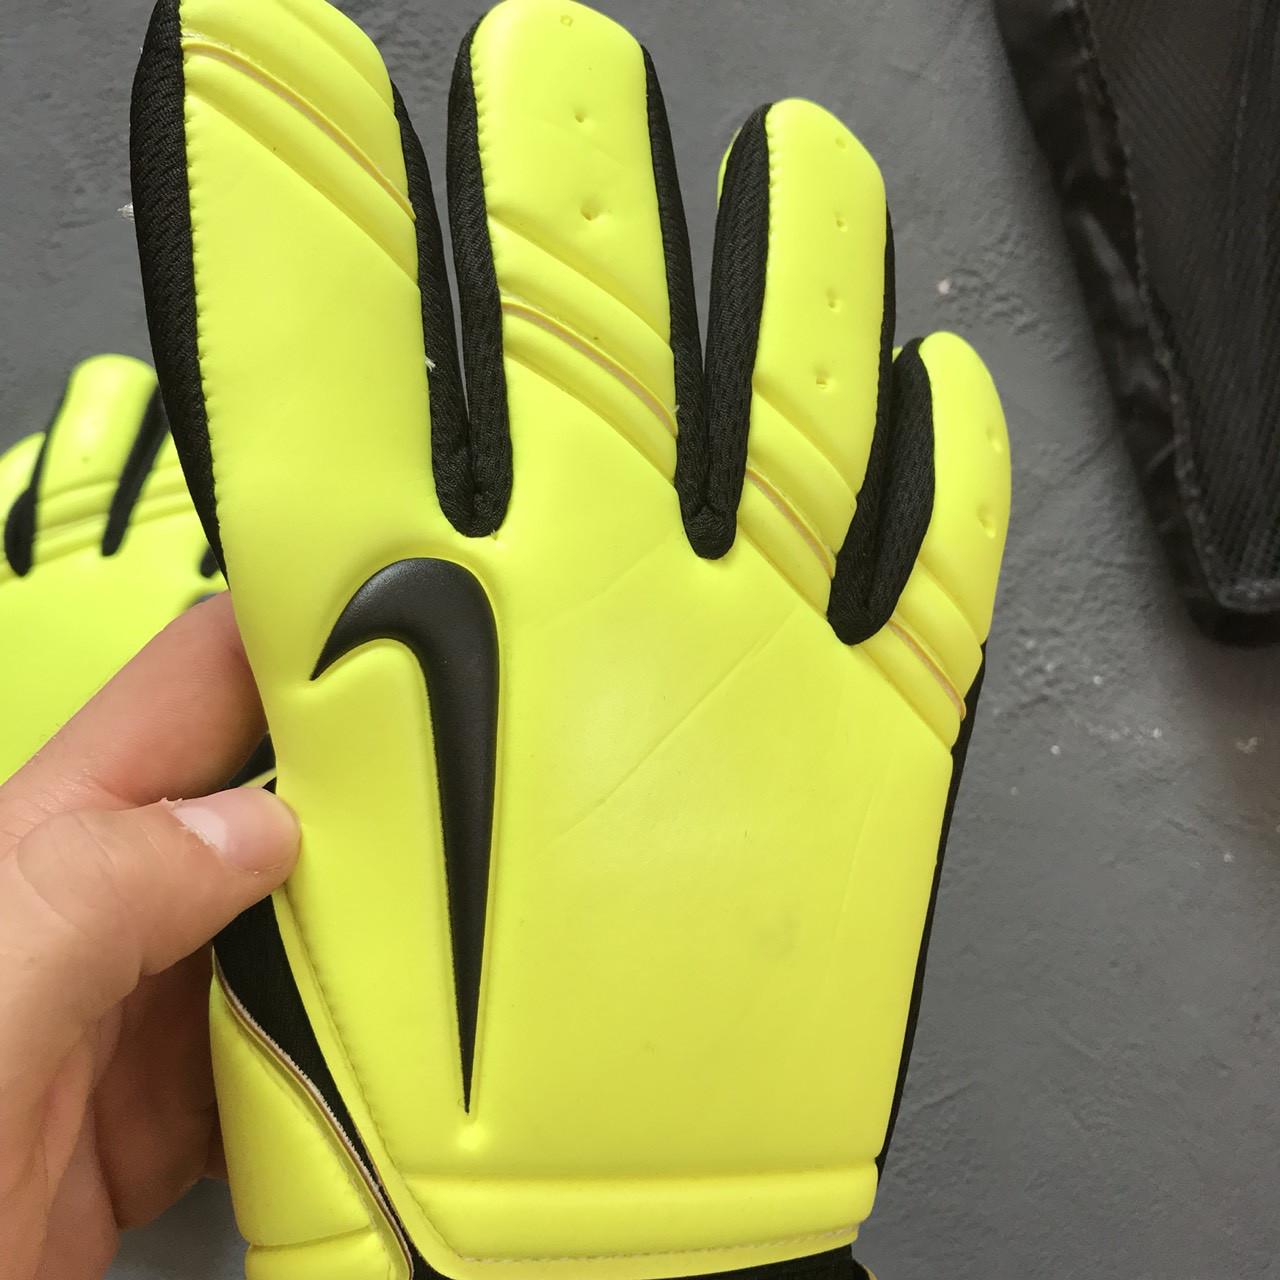 fbcb0dcd Вратарские перчатки Nike Gk Premier, цена 890 грн., купить в Киеве —  Prom.ua (ID#748545837)